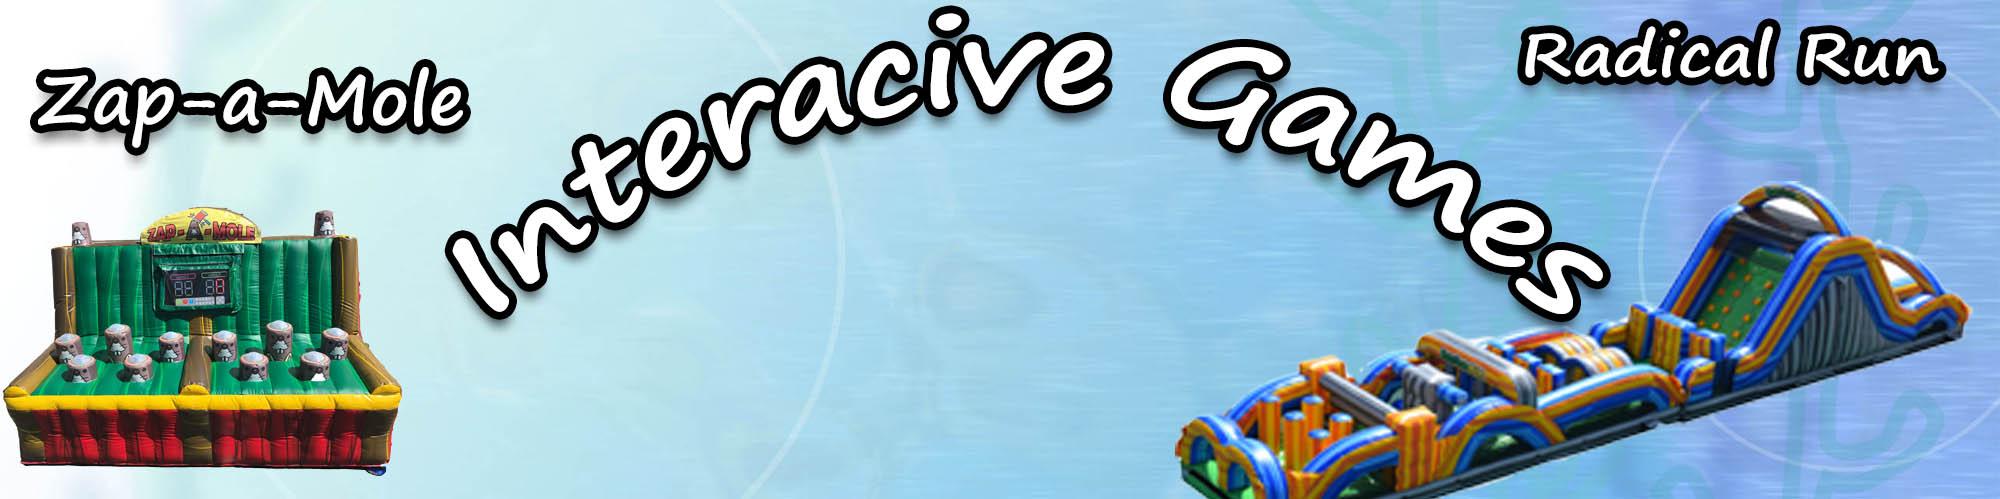 Interactive Game Rentals Santa Rosa